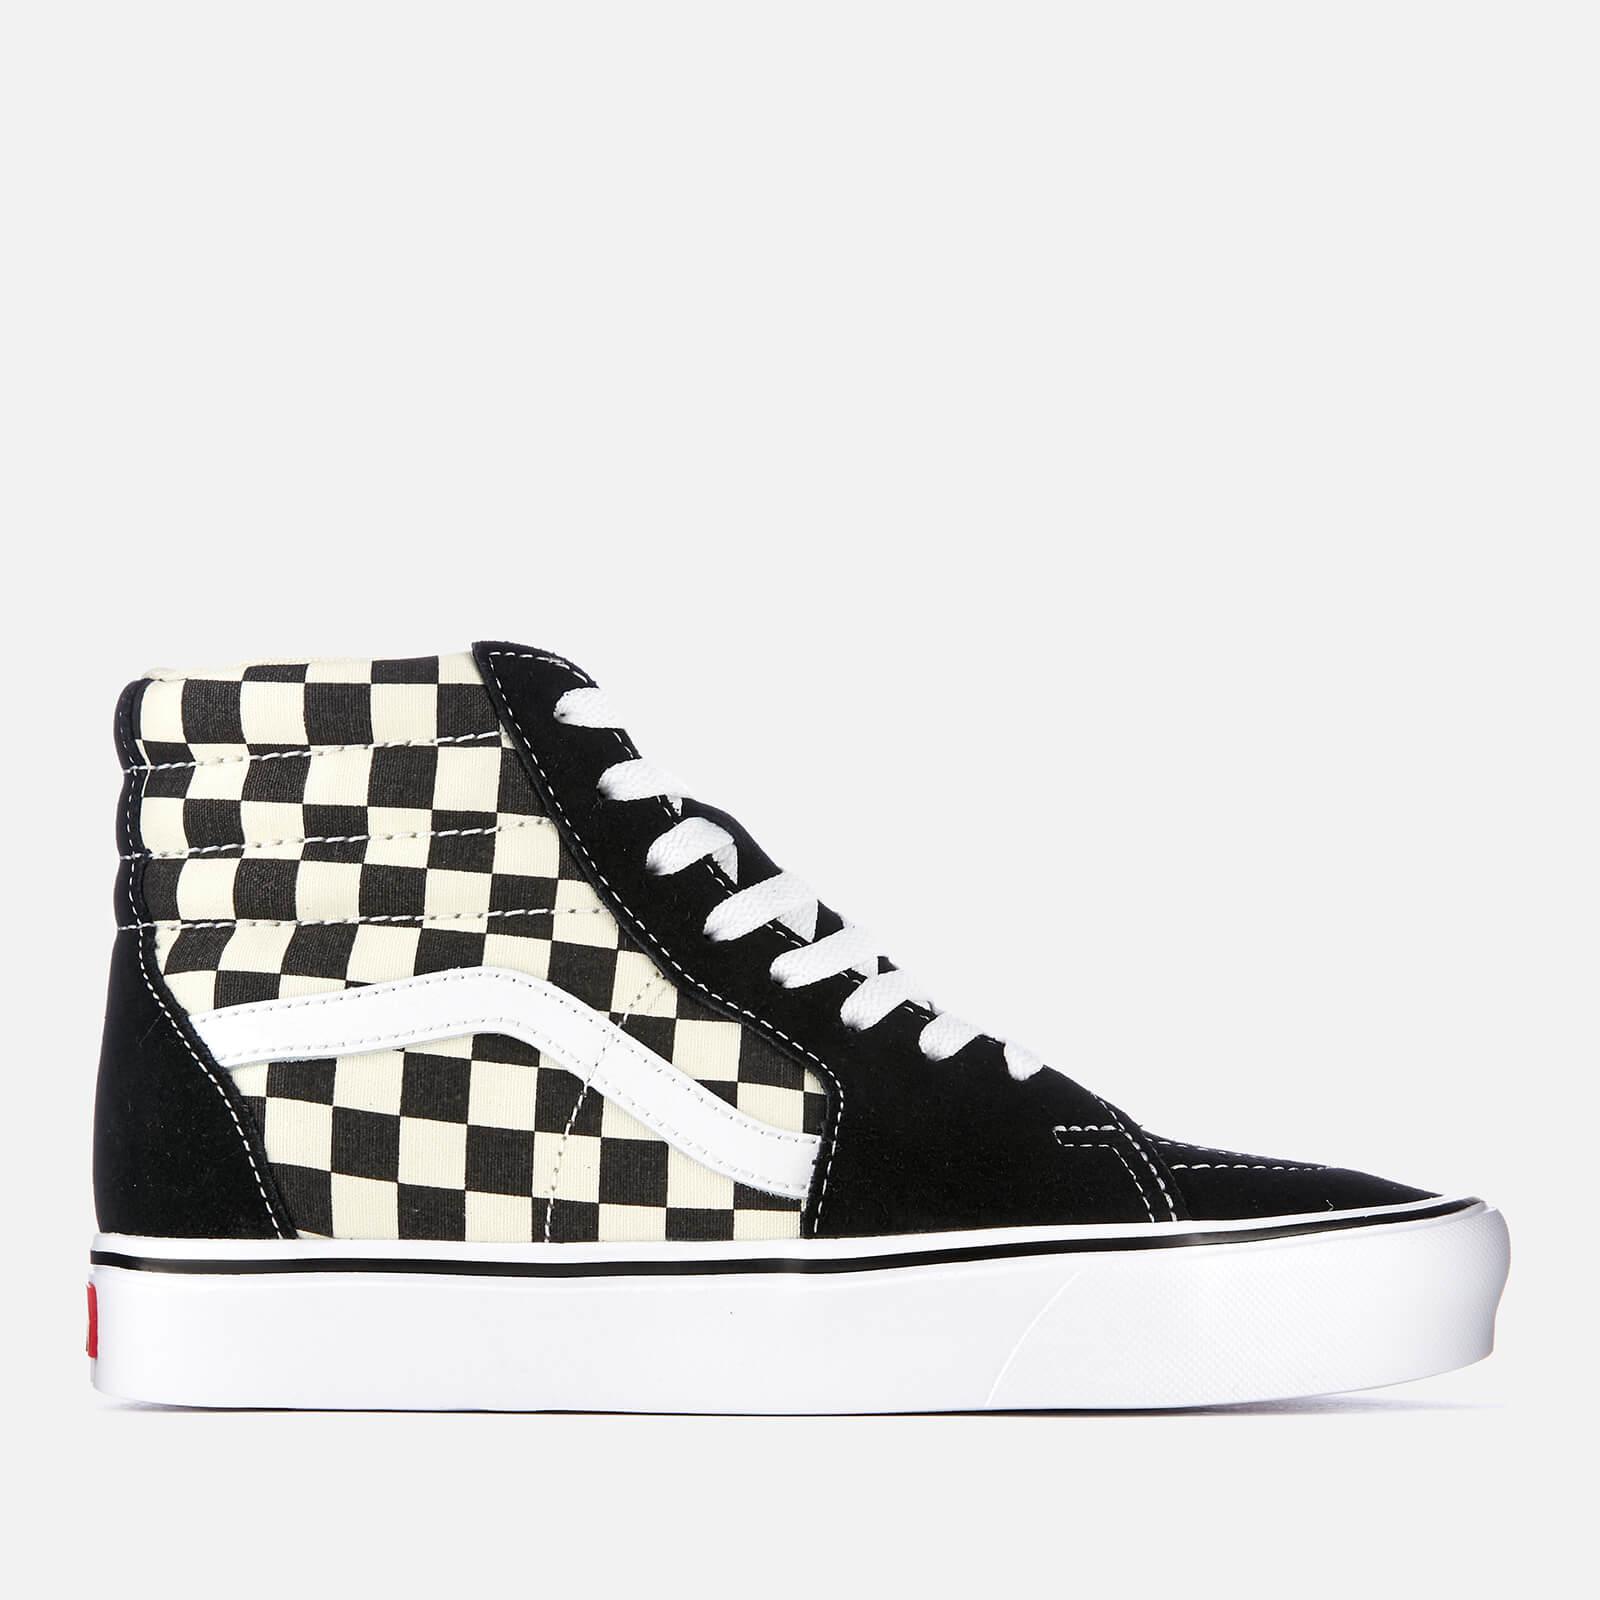 90ac720ae7 Vans Checkerboard Sk8 Hi-Top Lite Trainers - Black White